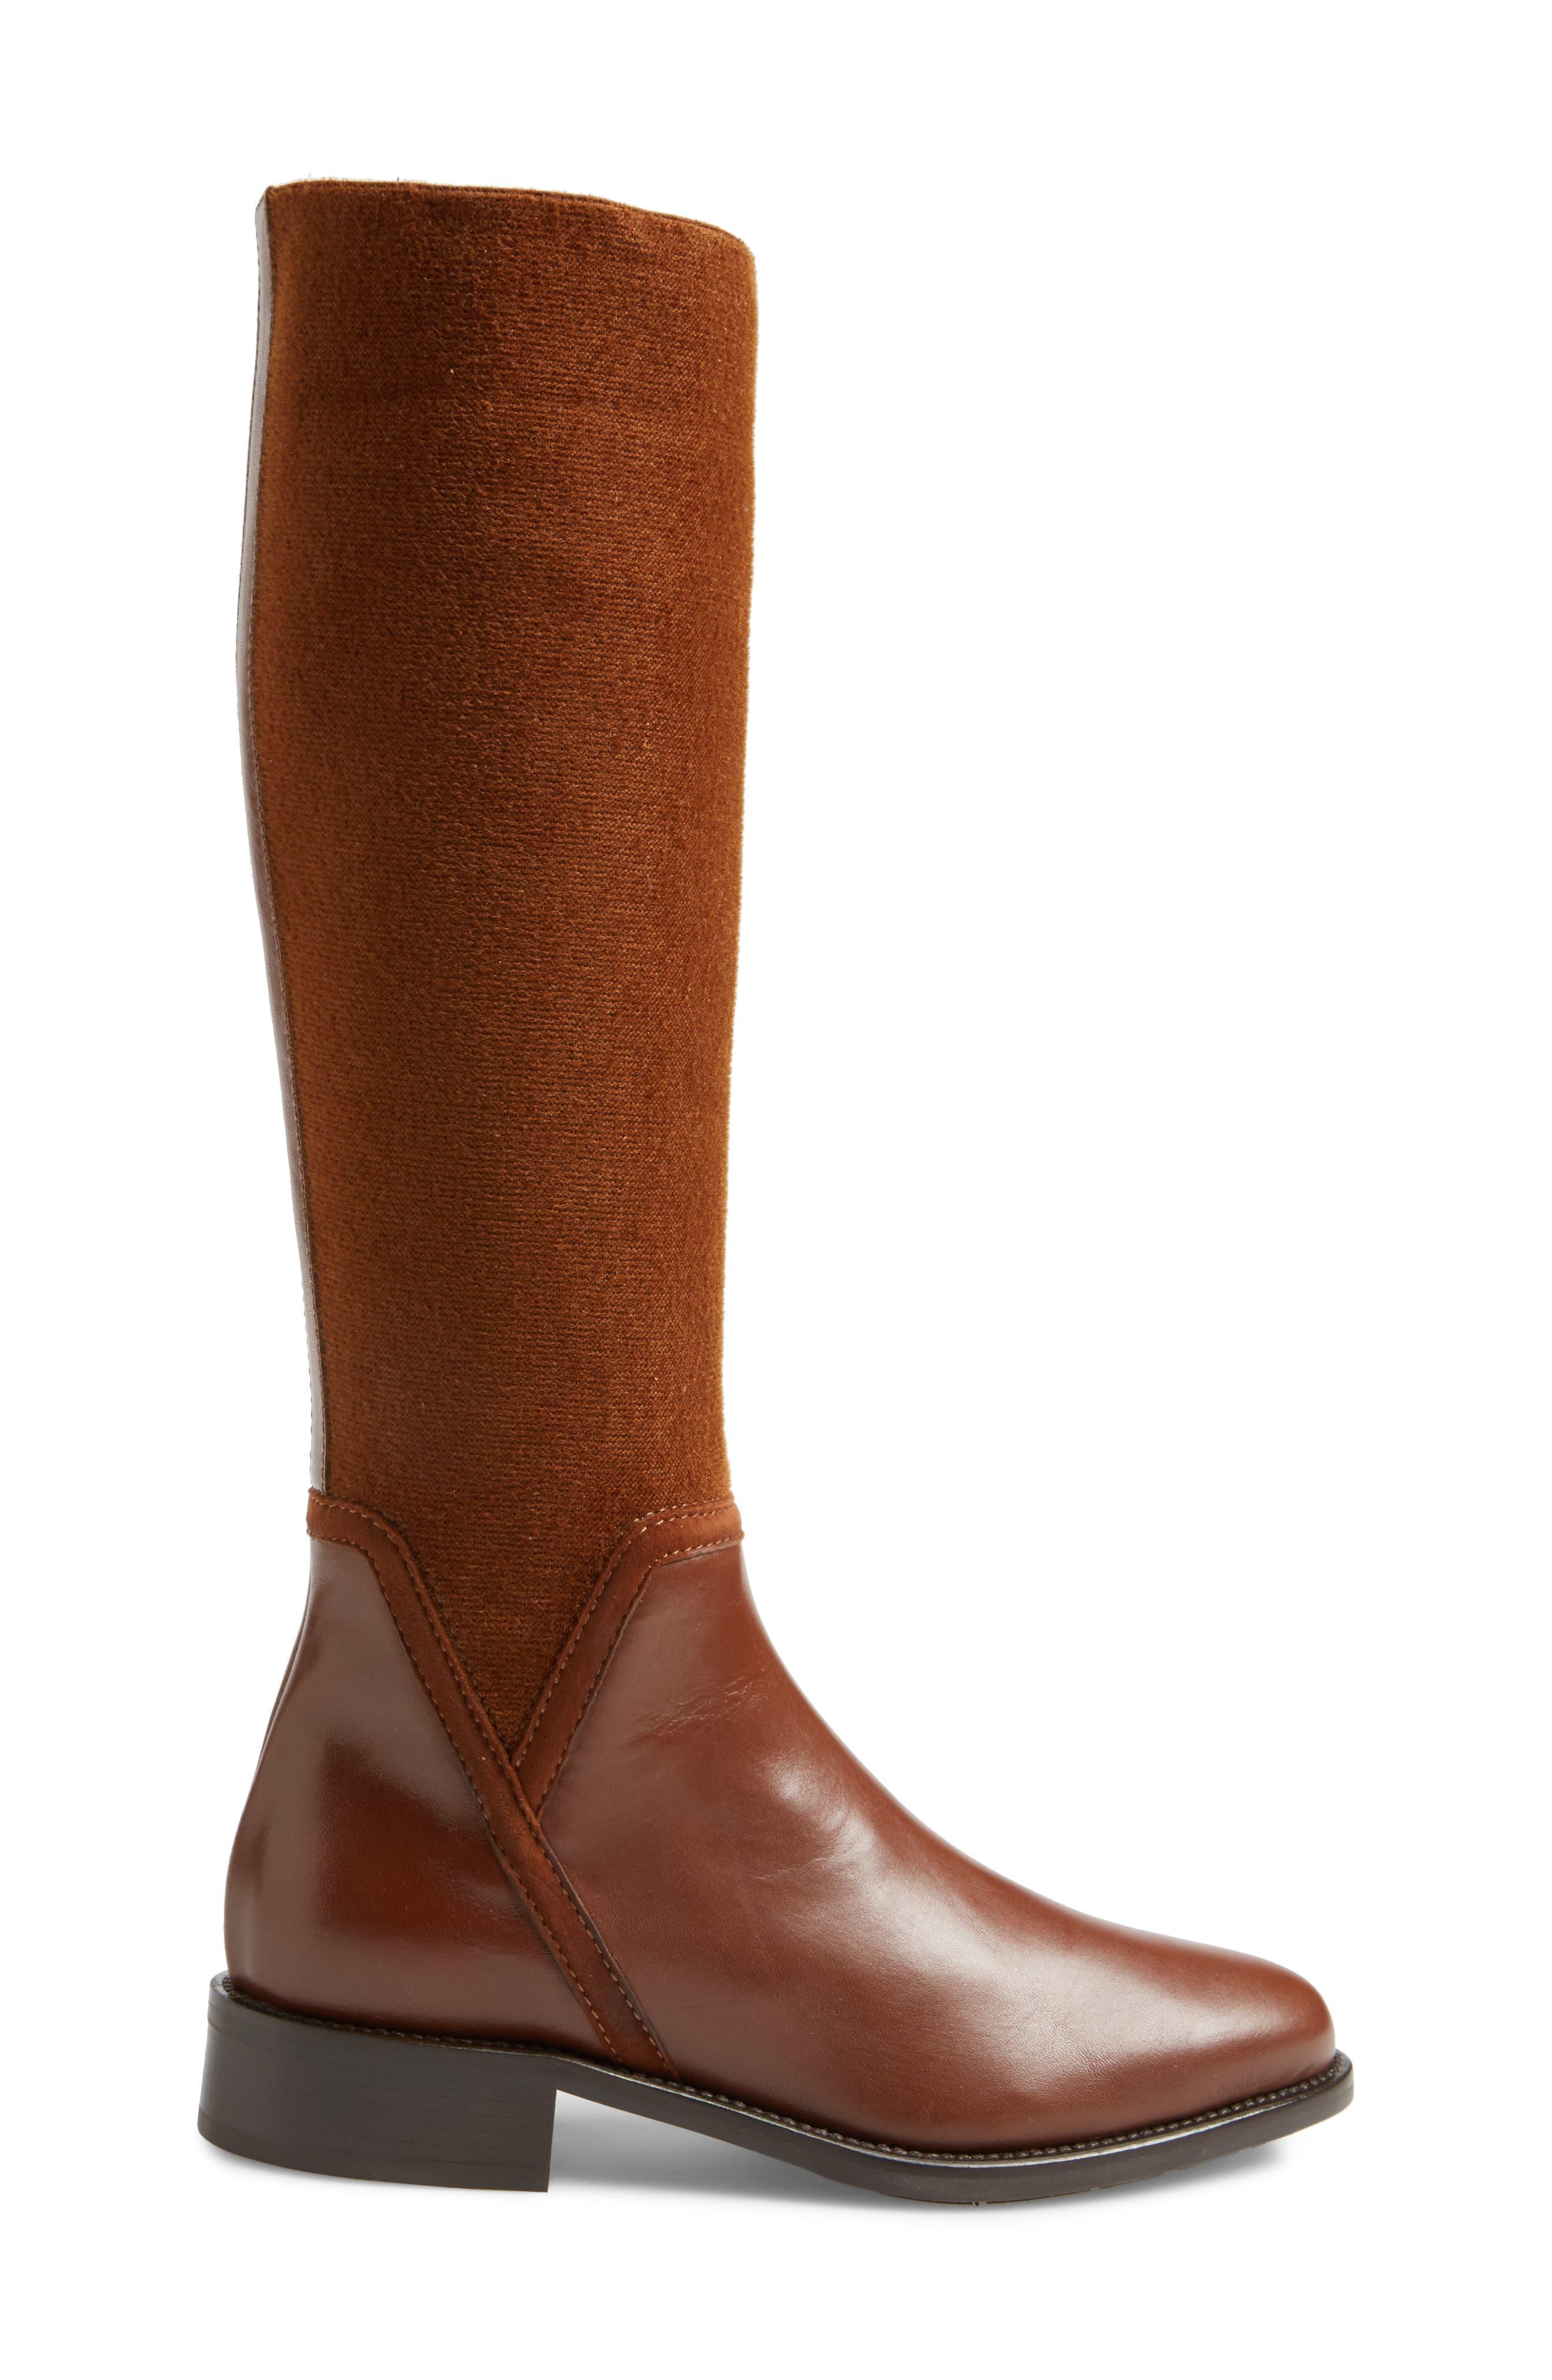 Alternate Image 3  - Aquatalia Nicolette Weatherproof Knee High Boot (Women)